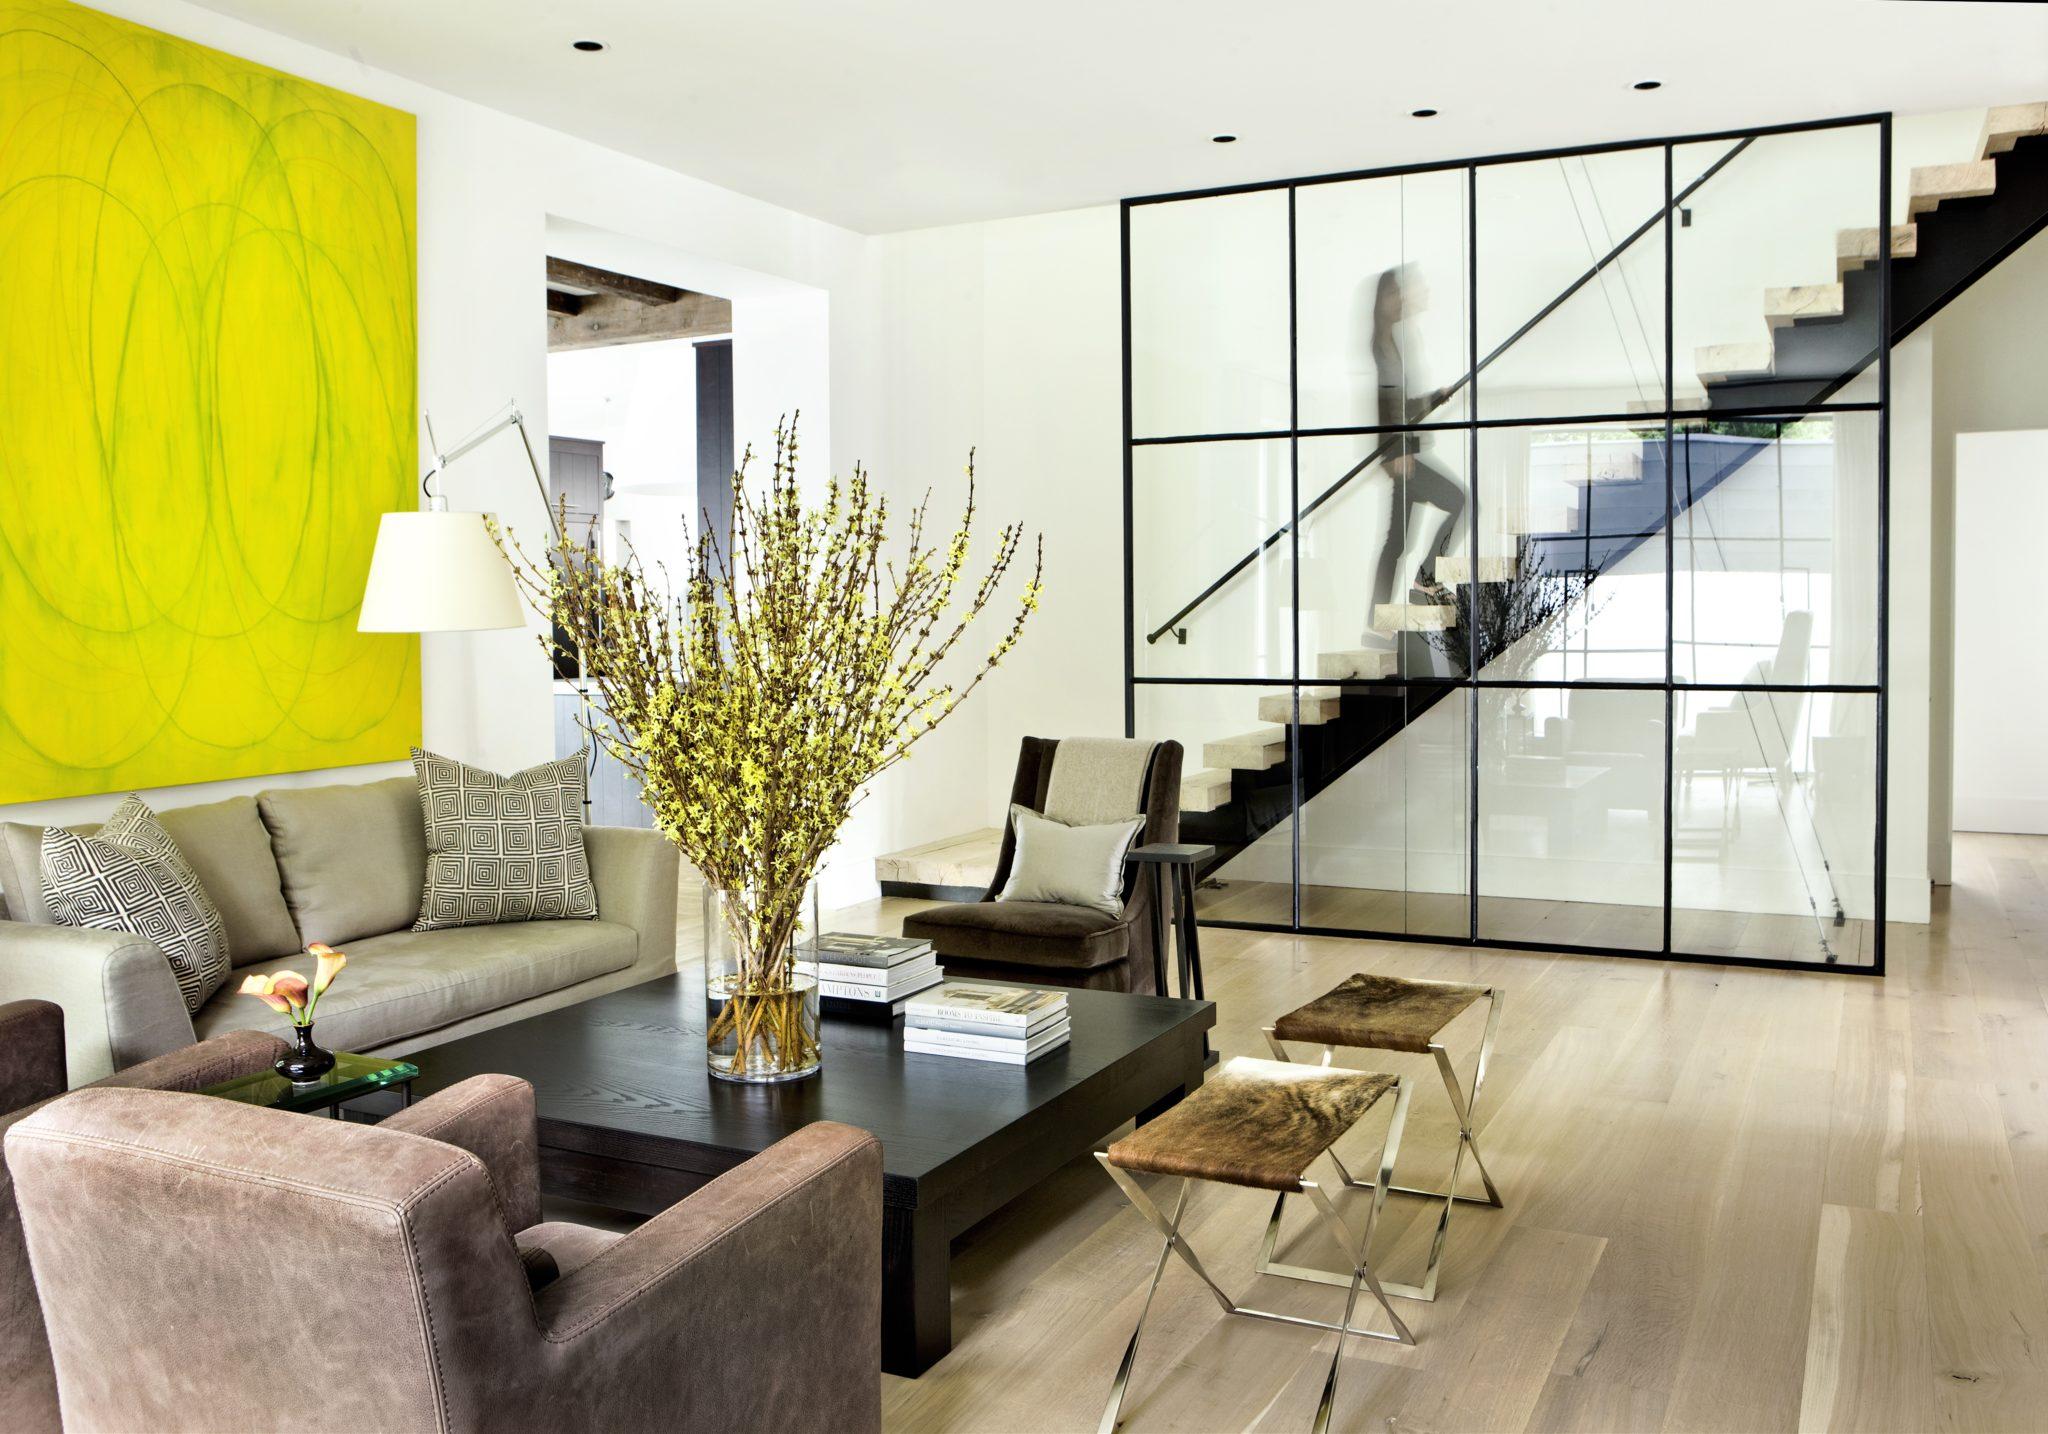 Interior design by Amy Morris